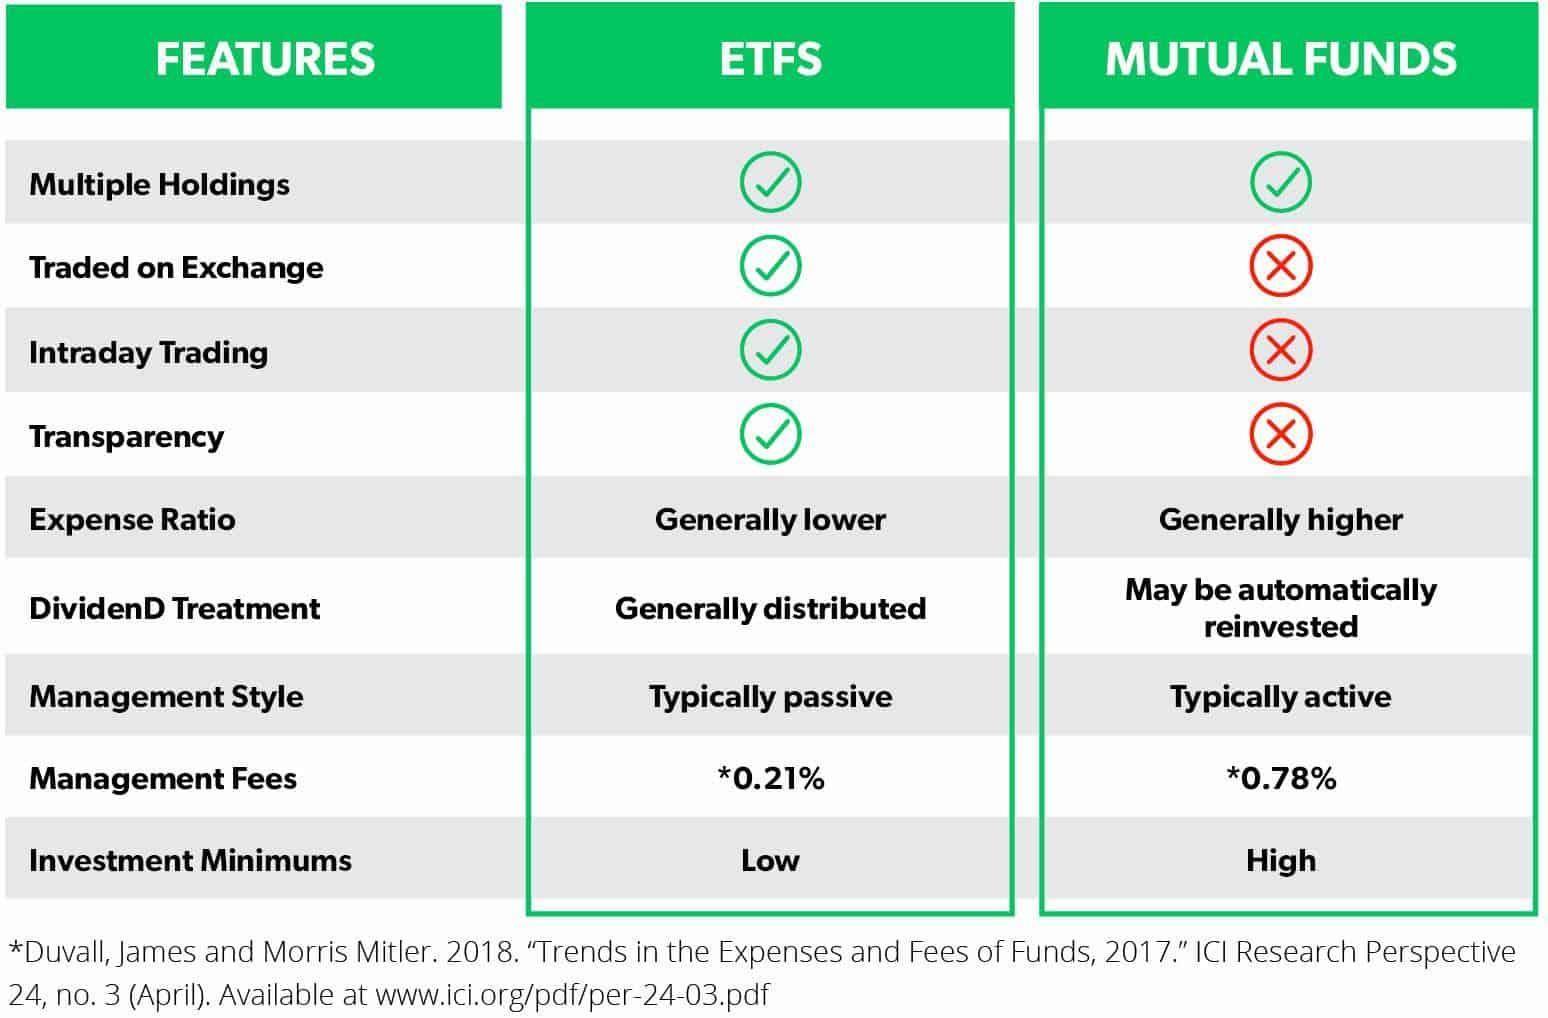 ETF vs. Mutual Fund